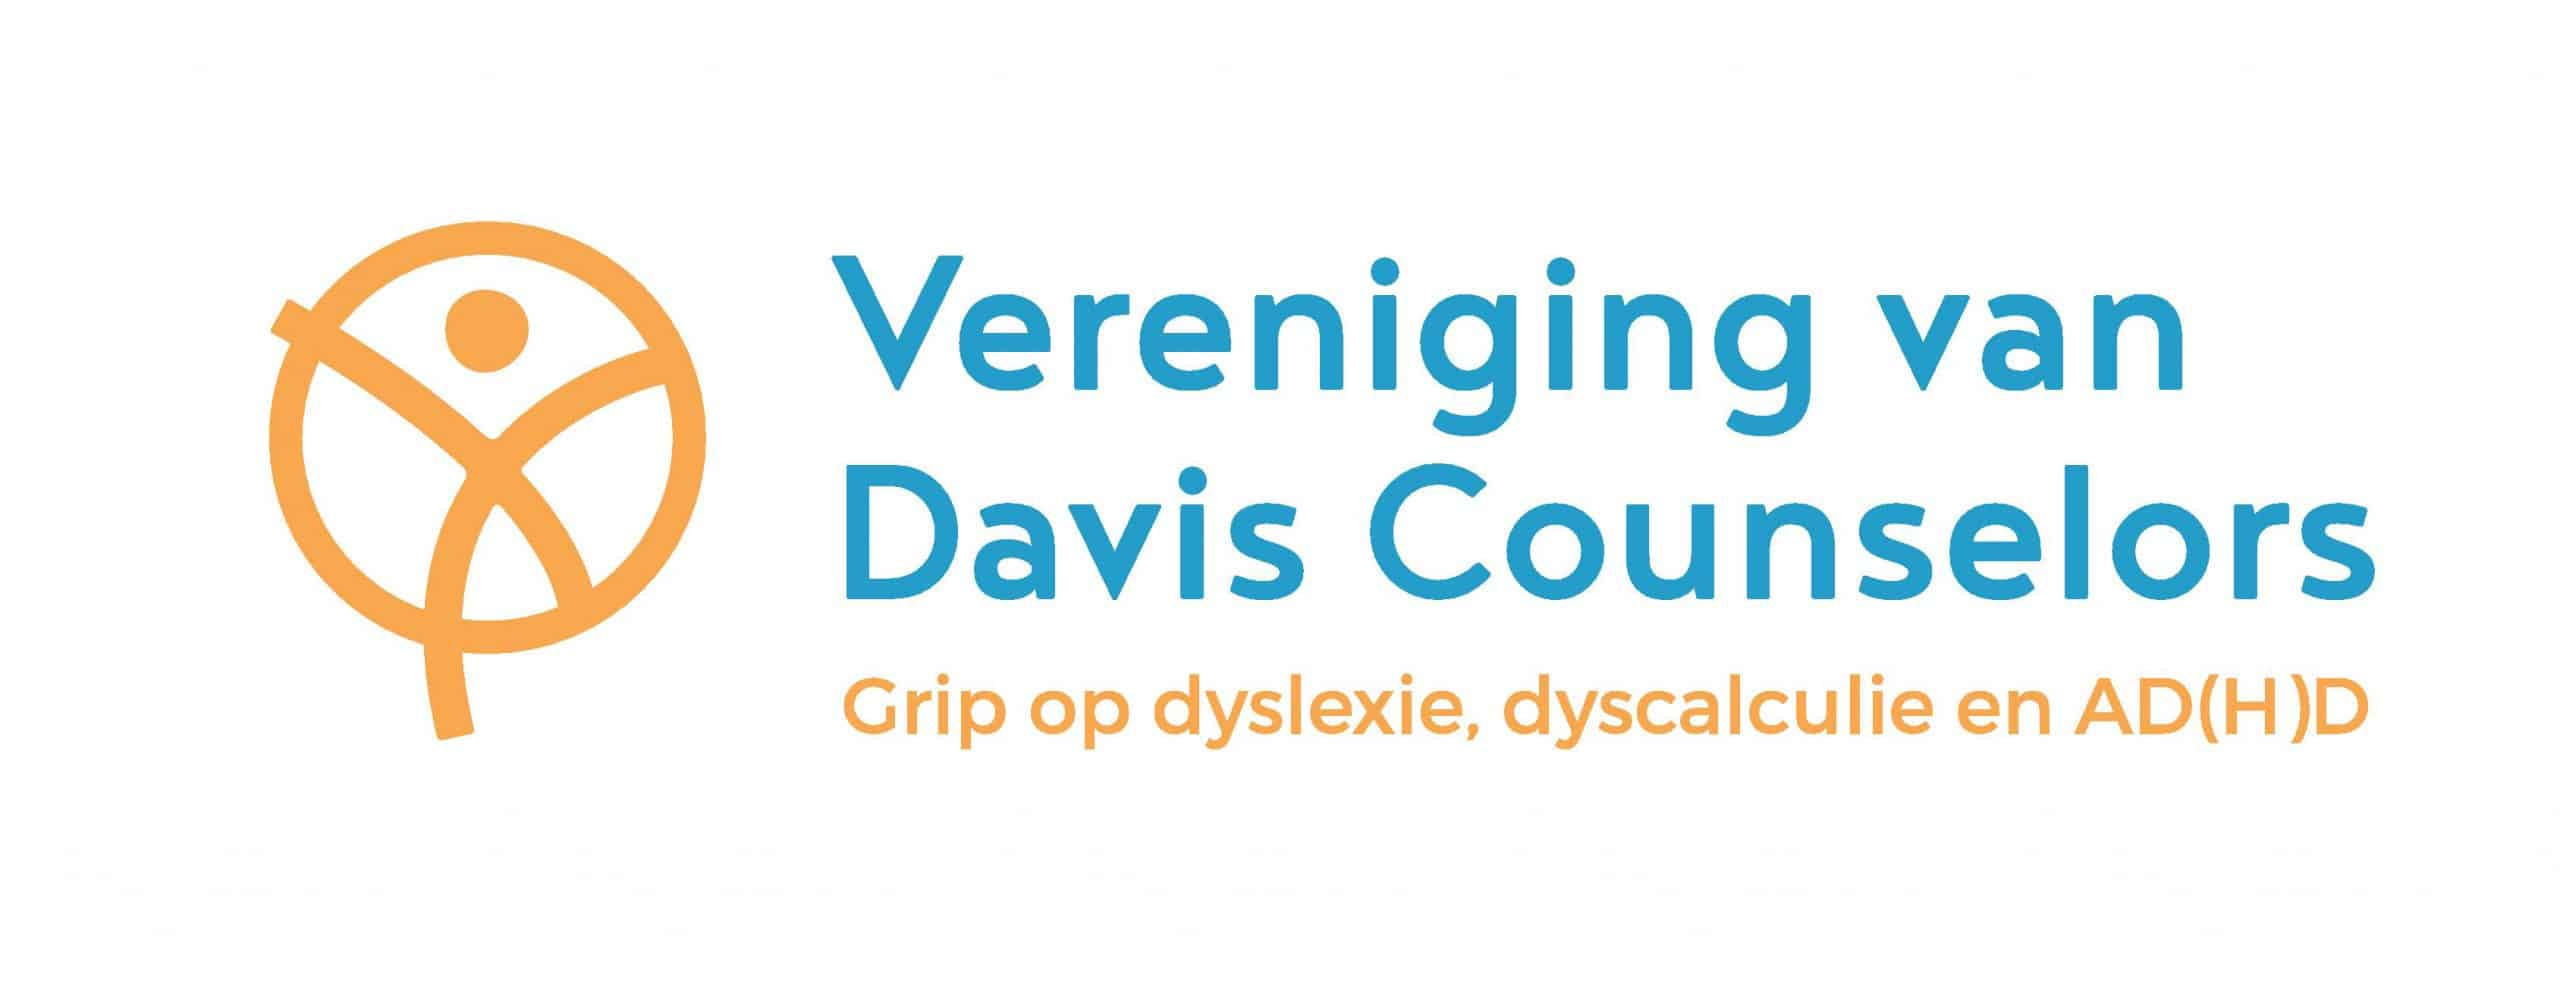 Logo Vereniging van Davis Counselors